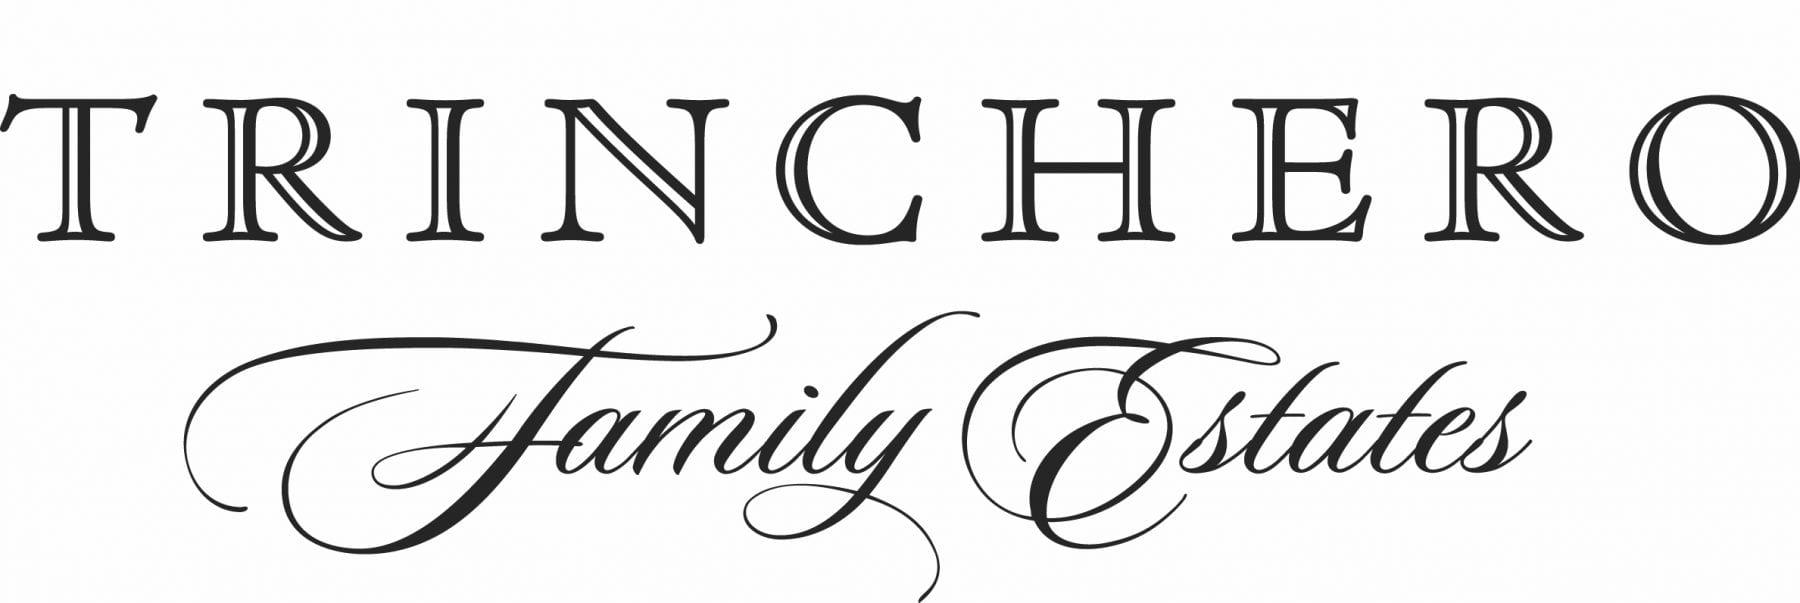 Trinchero-Family-Estates-High-Res-Logo